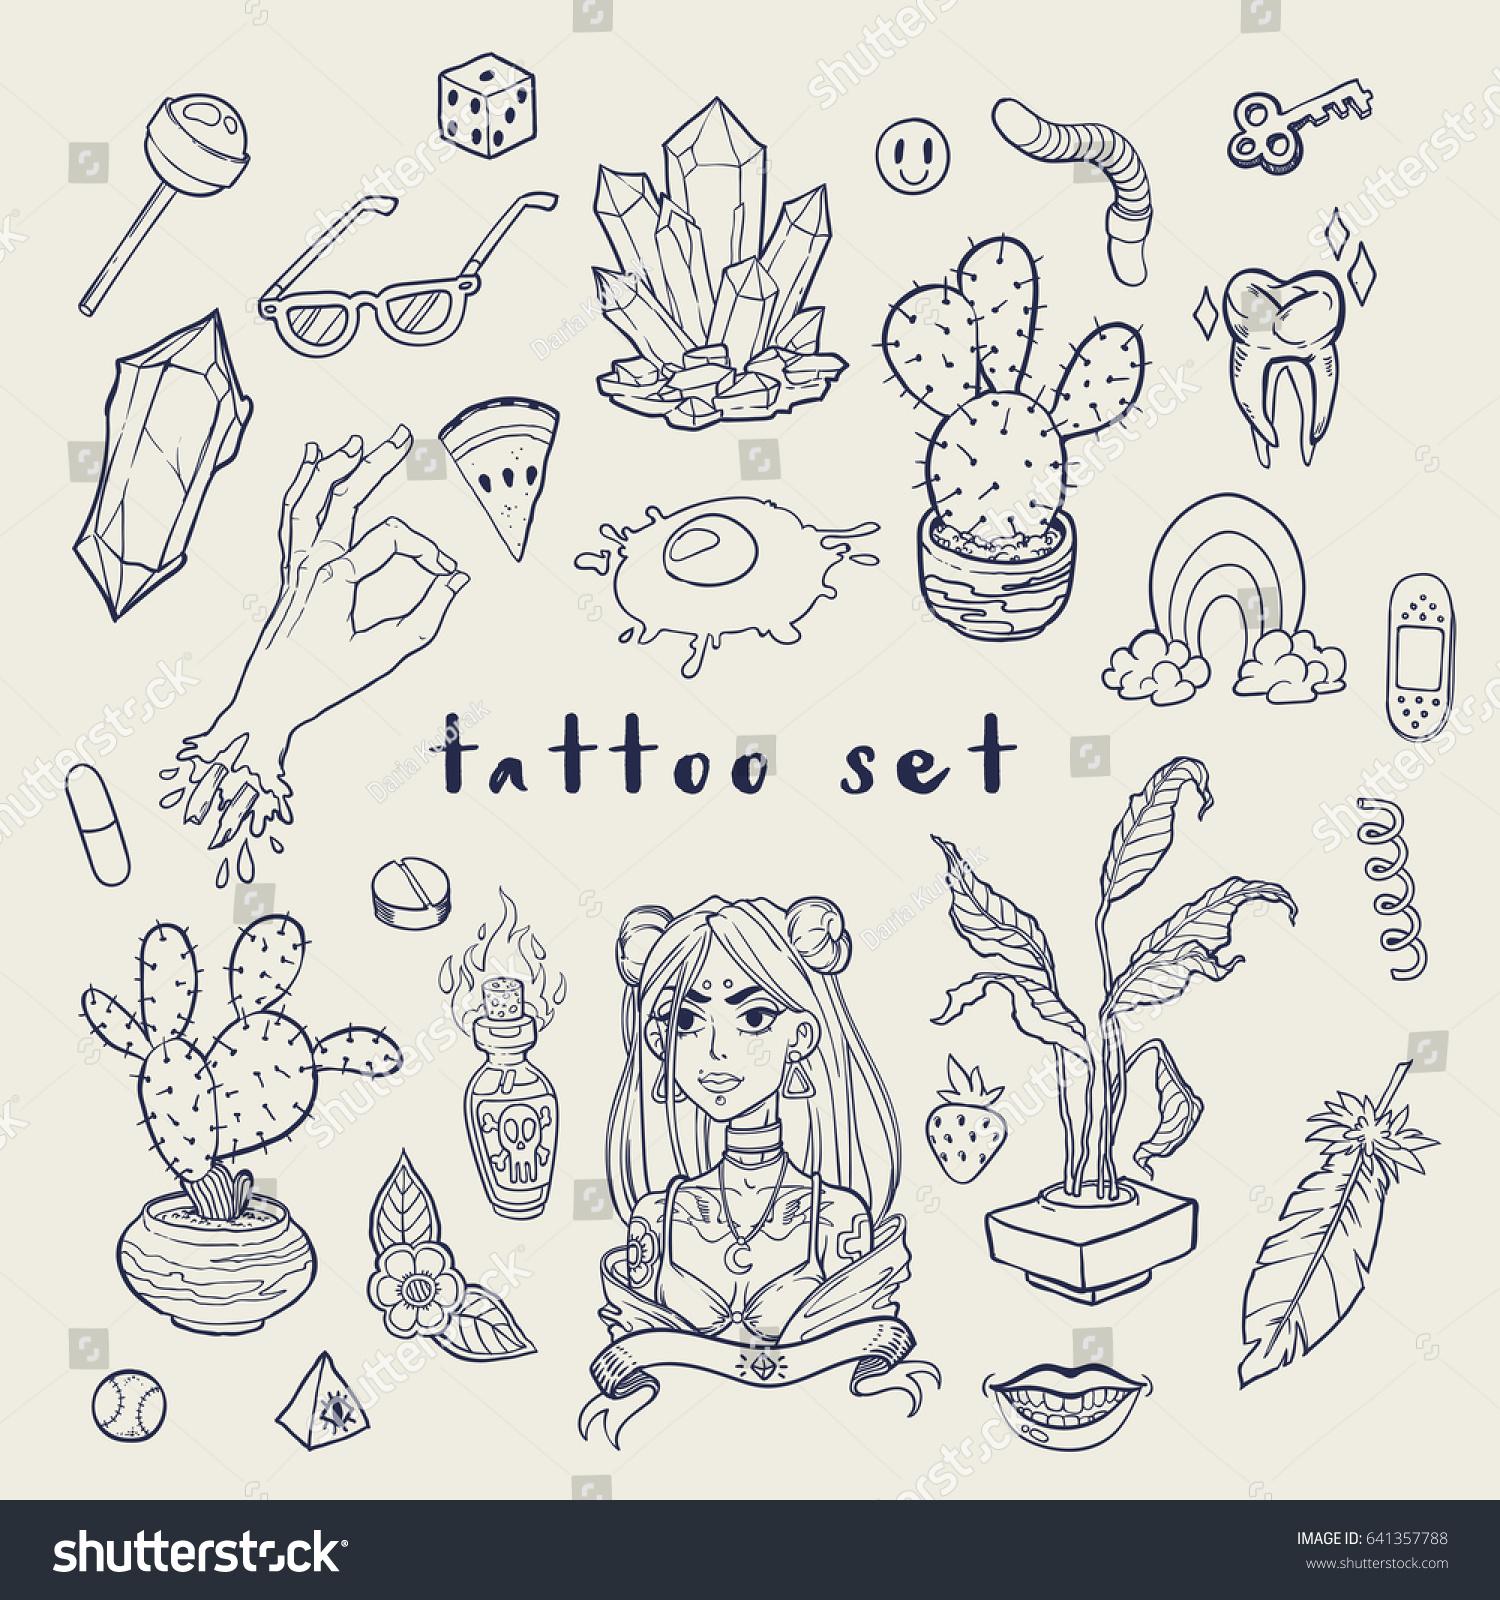 25d2731d7e872 Set of Old School Tattoo Elements. Tattoo-art design. Hand-drawn vector.